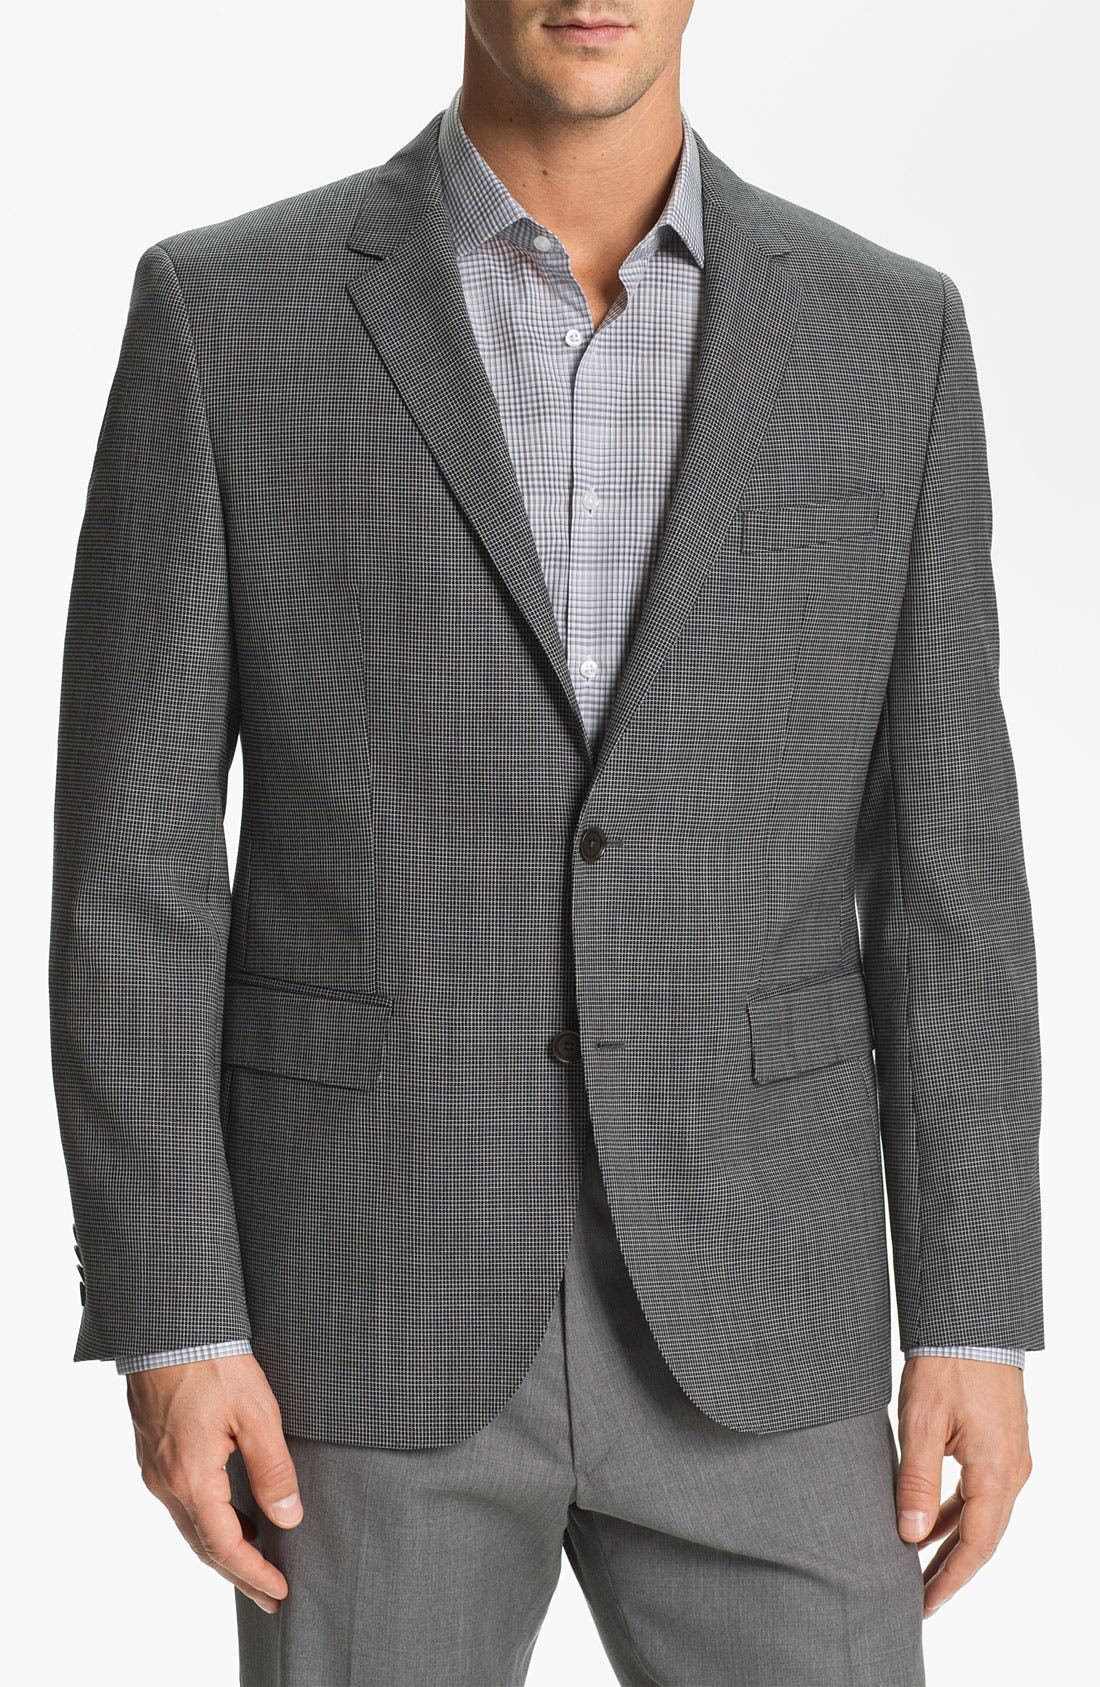 Alternate Image 1 Selected - BOSS Black 'Keys' Trim Fit Check Sportcoat